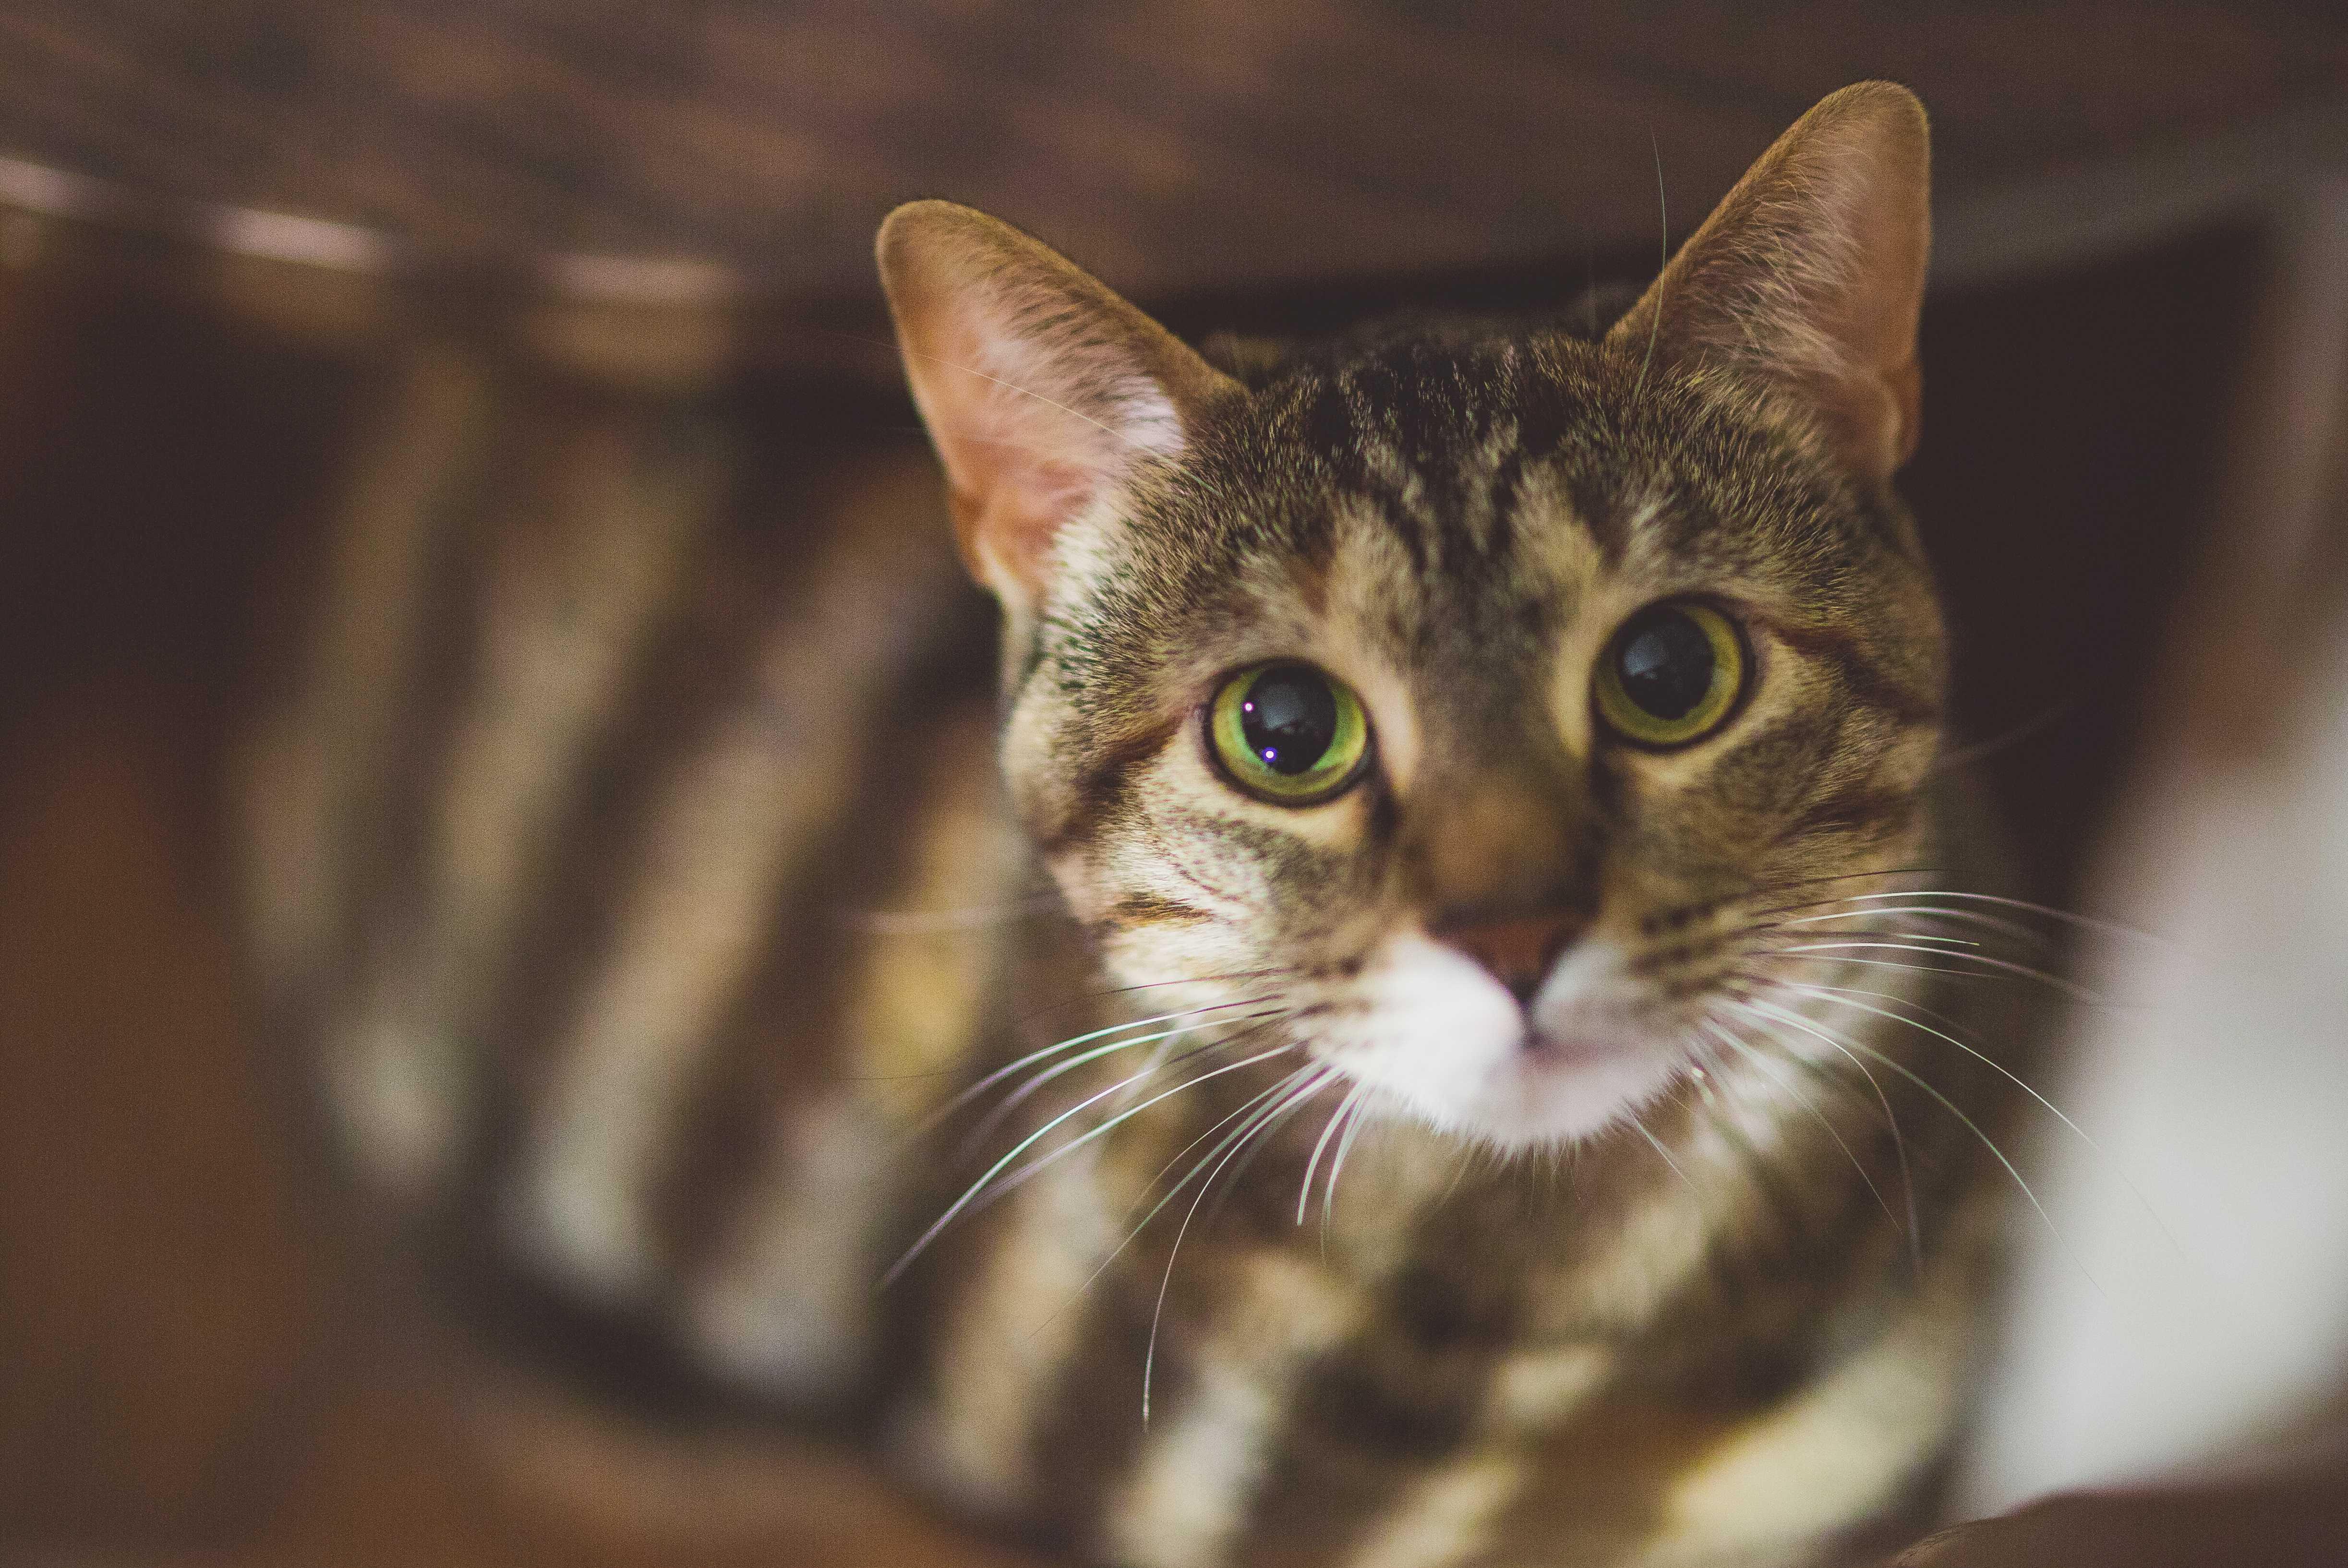 Энергетически кошки